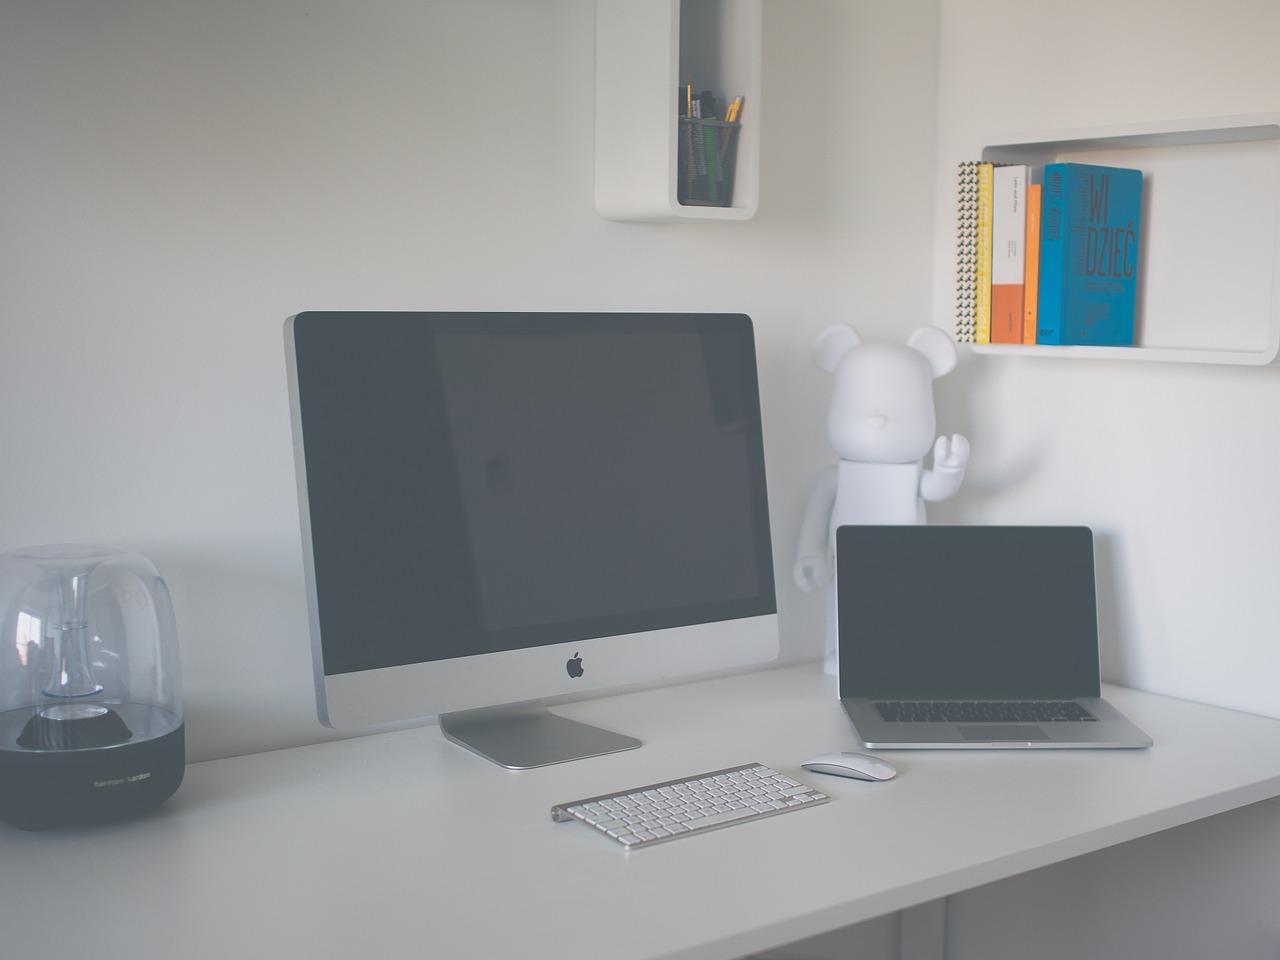 desk-1209319_1280